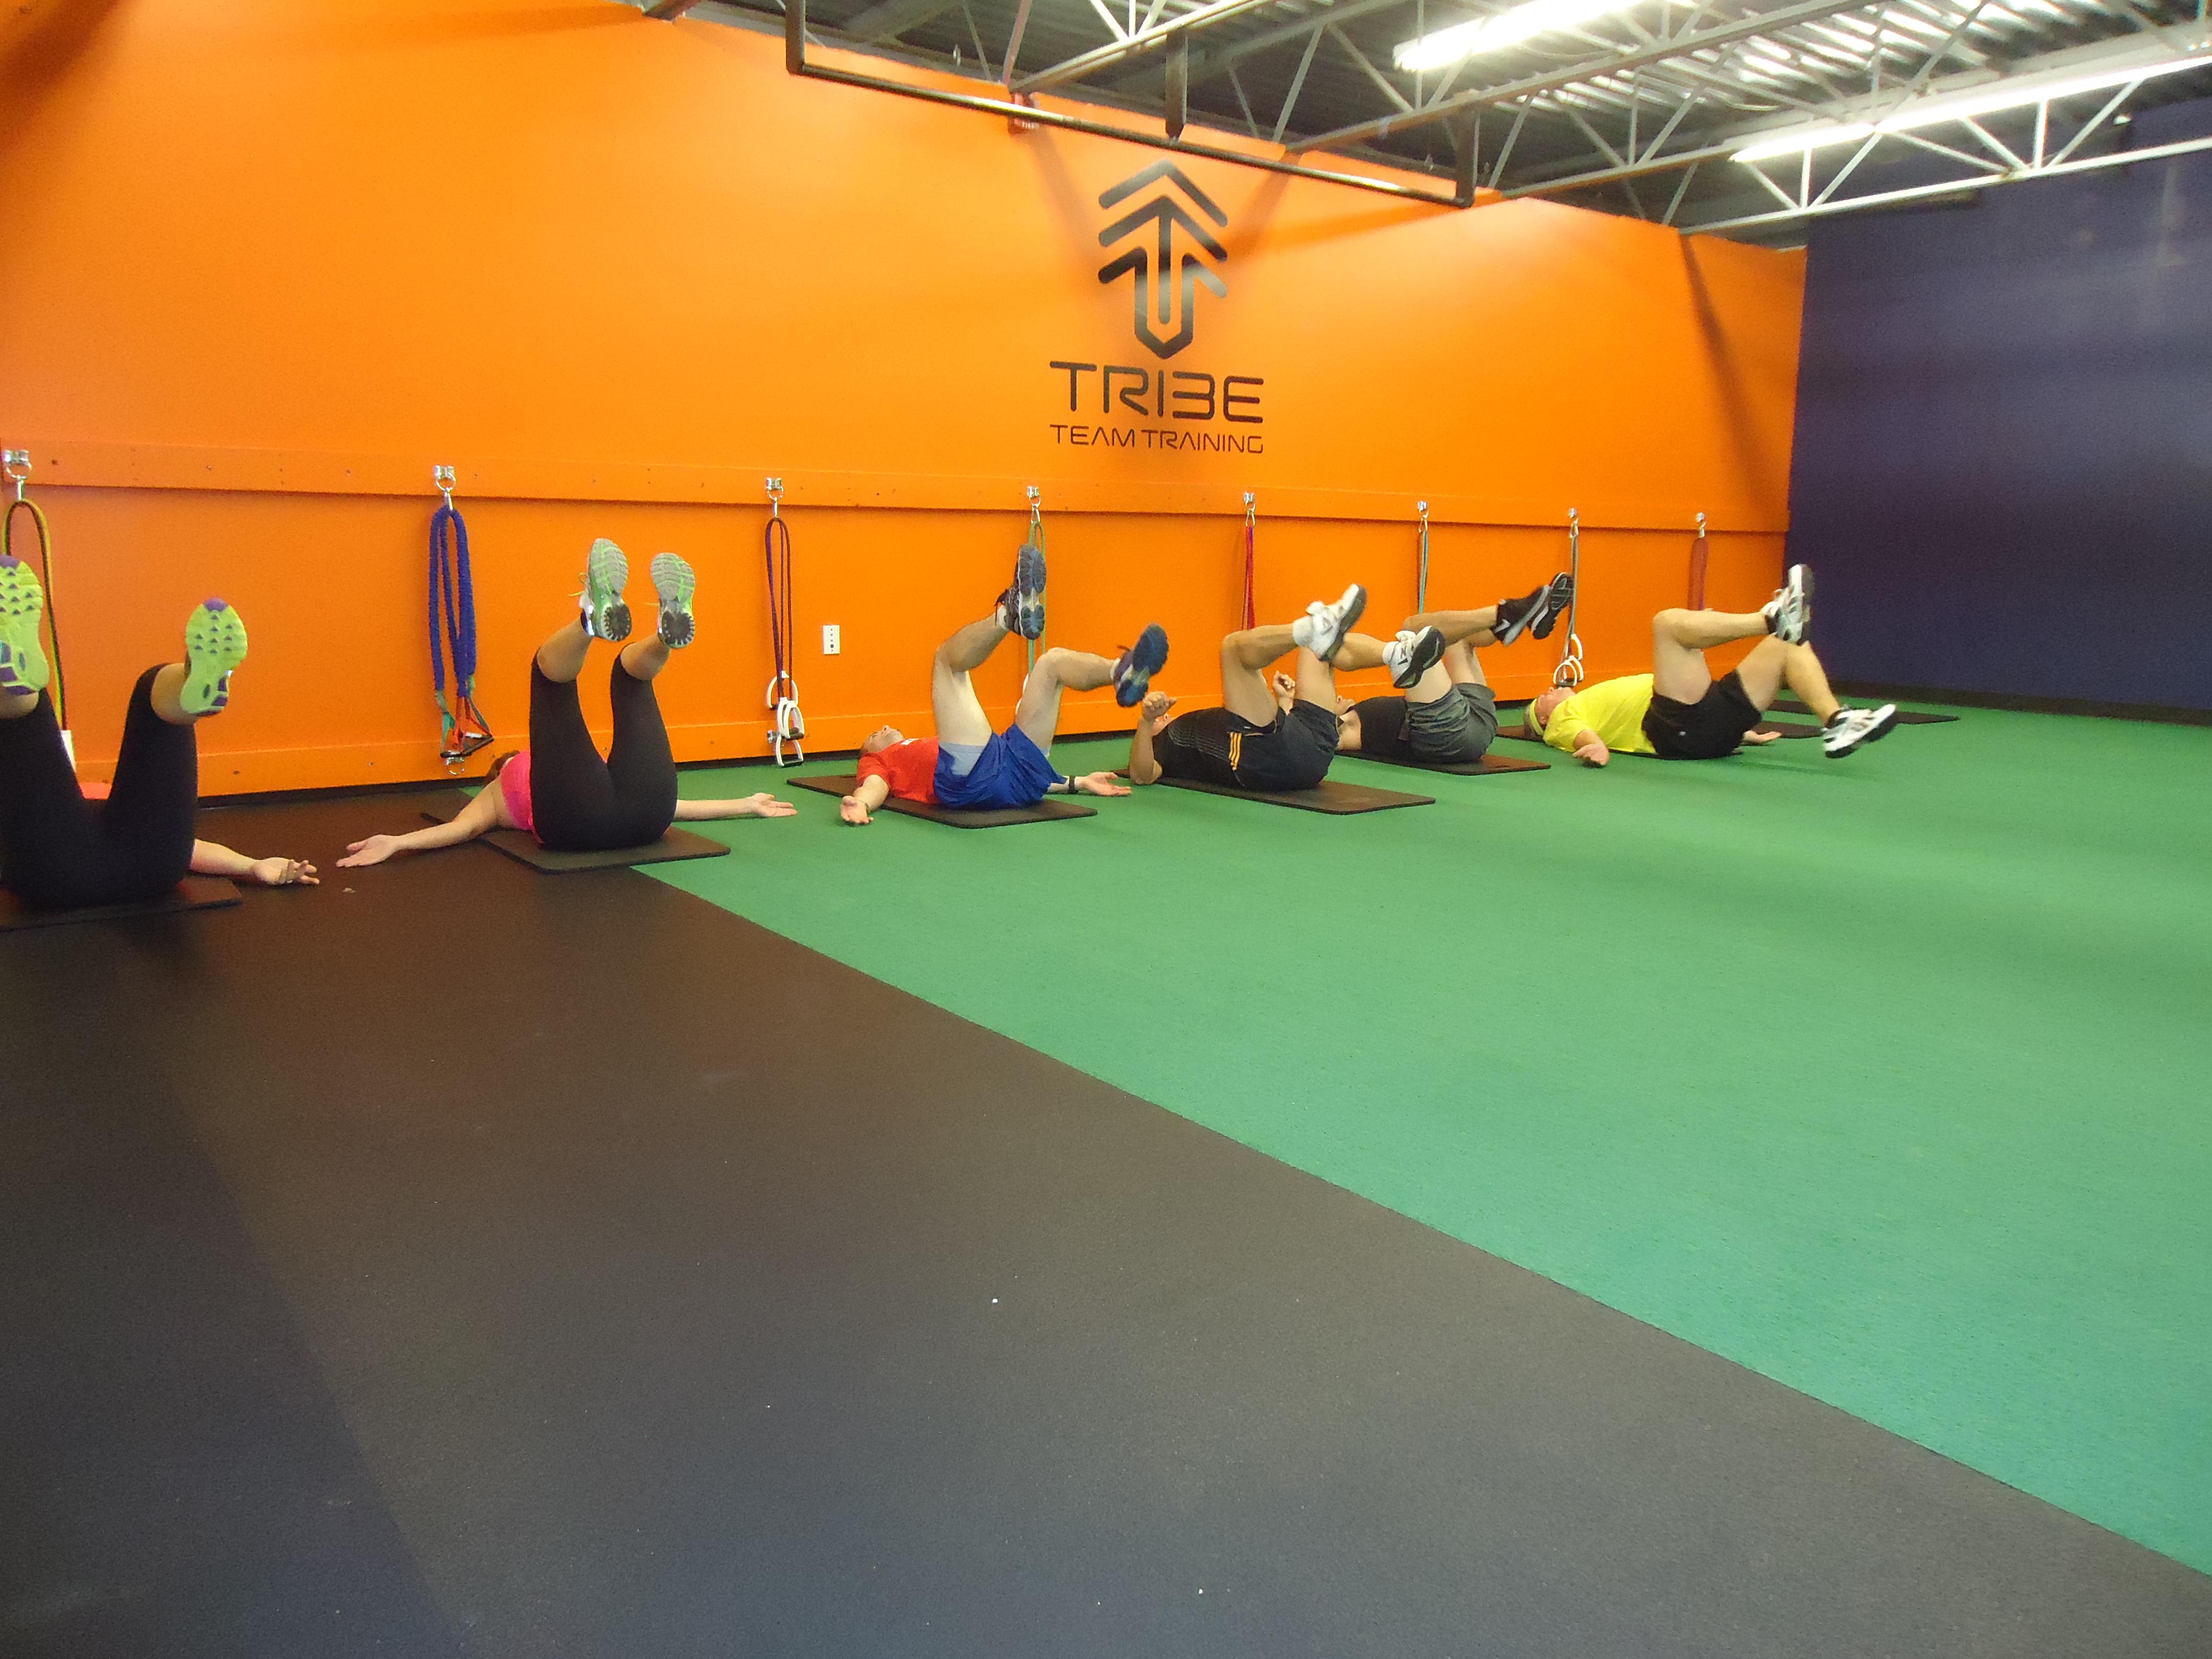 Everybodys Fitness Center image 4